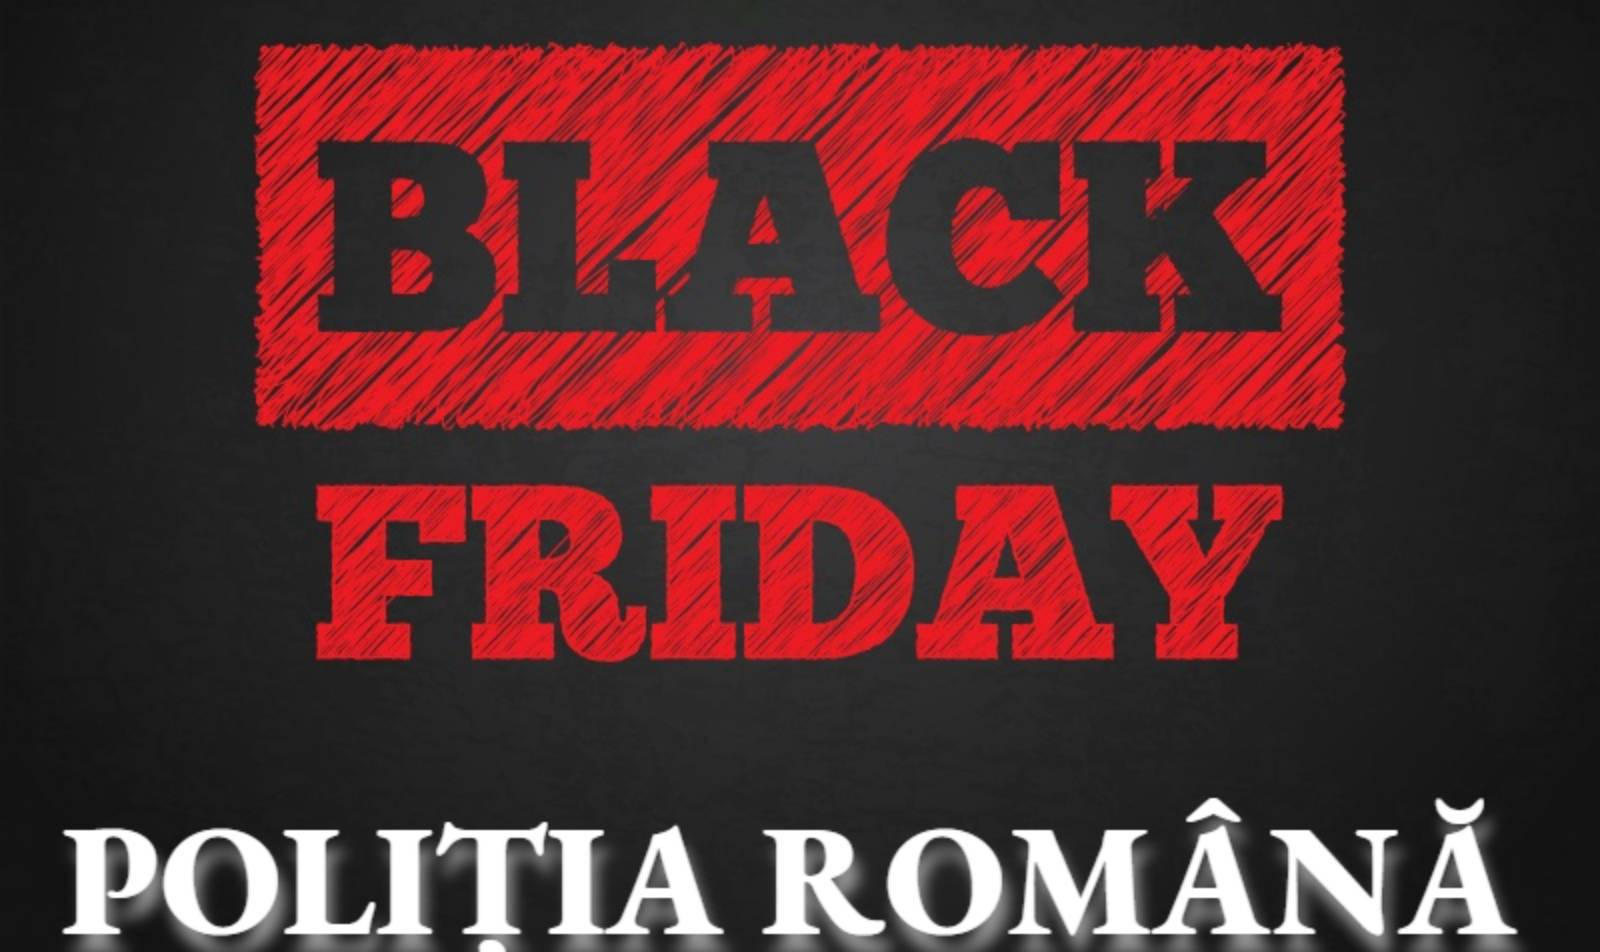 Politia Romana ATENTIE BLACK FRIDAY 2019